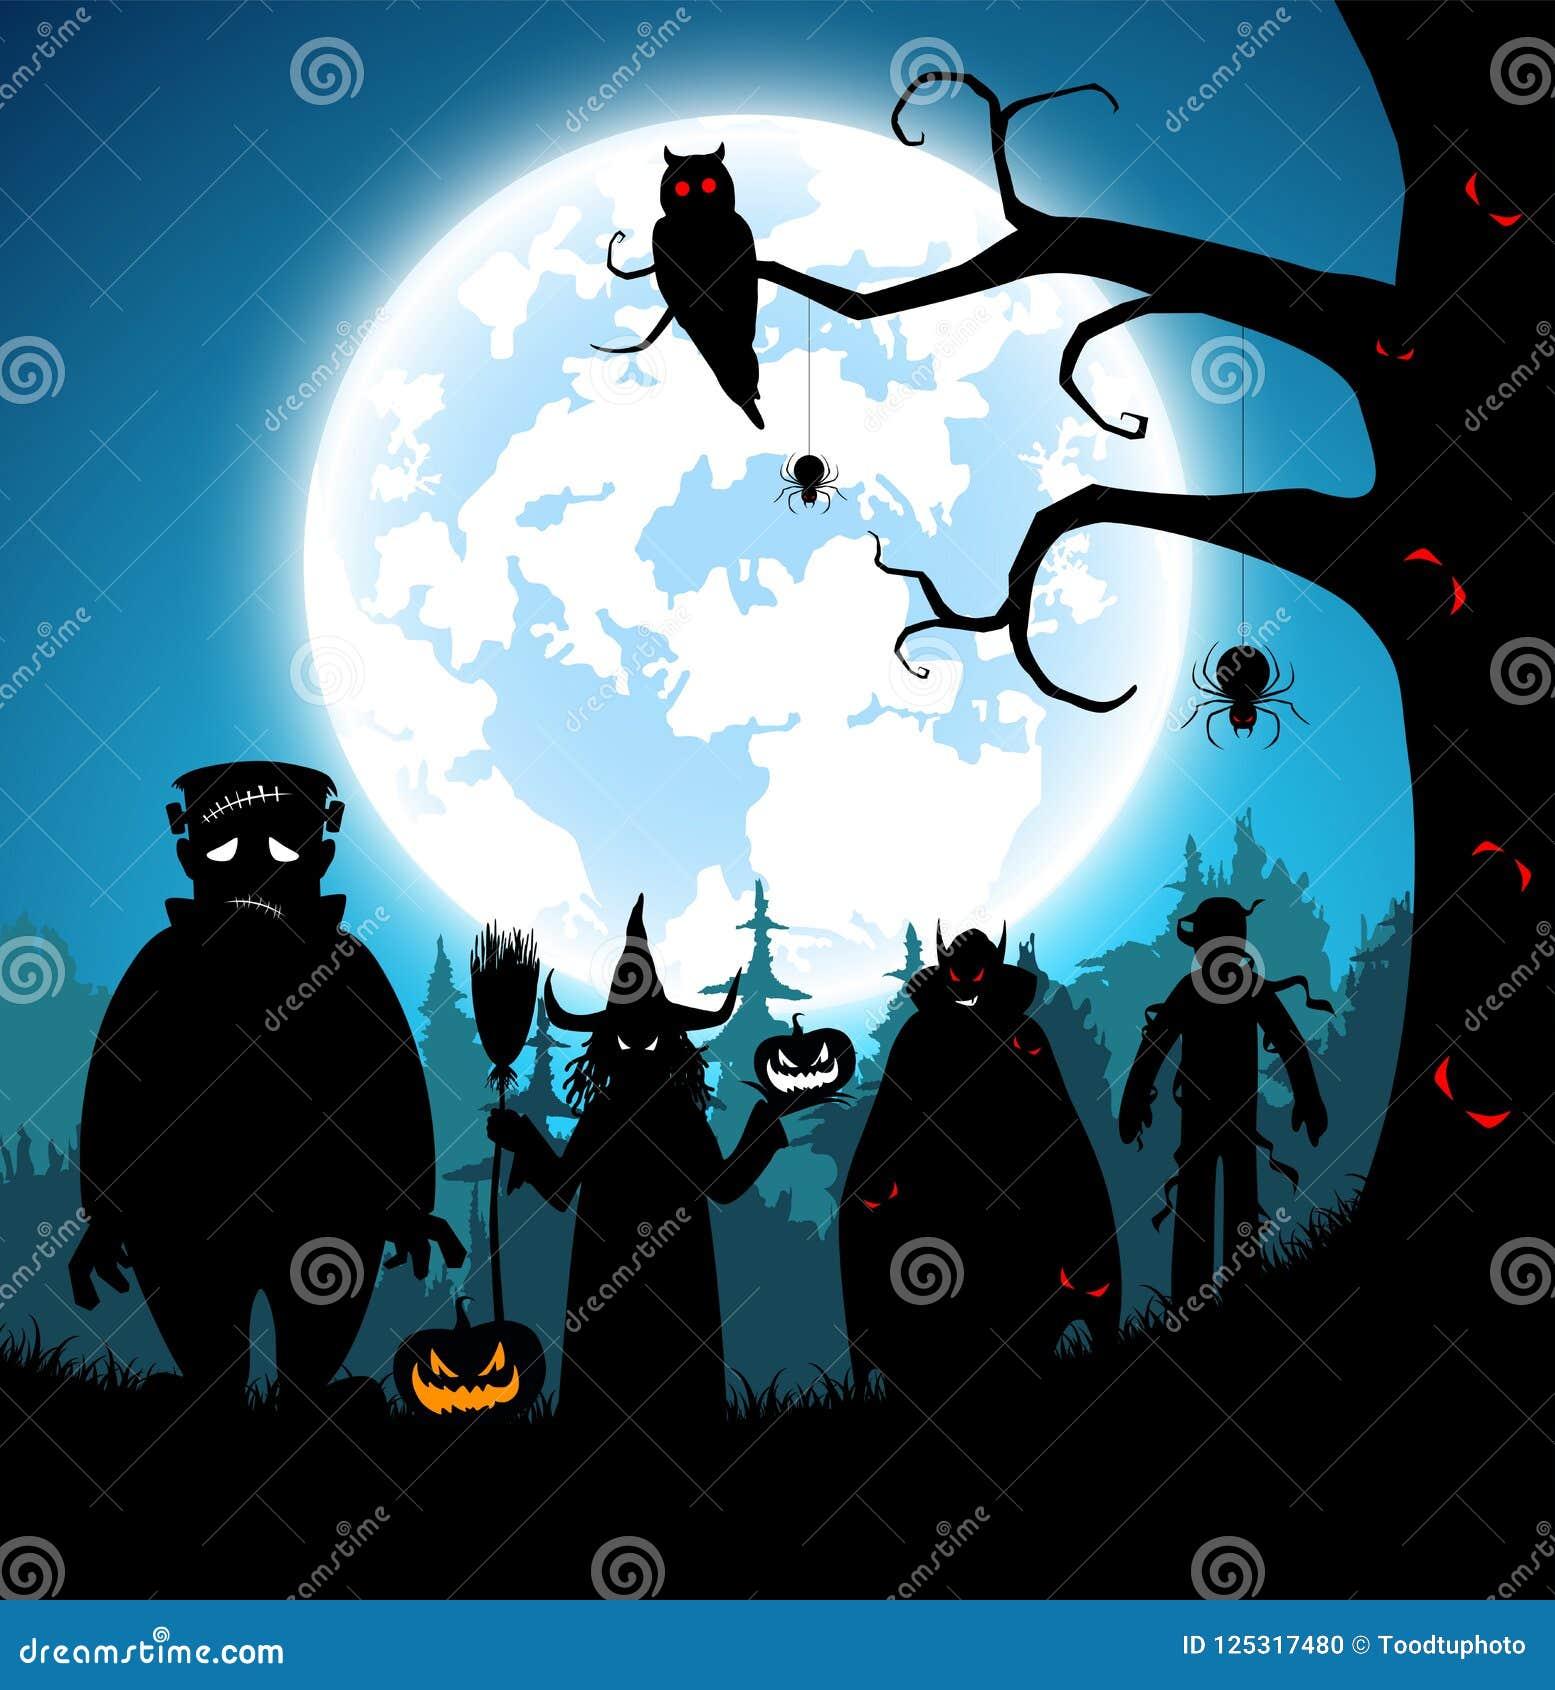 Illustration blue background,festival halloween concept